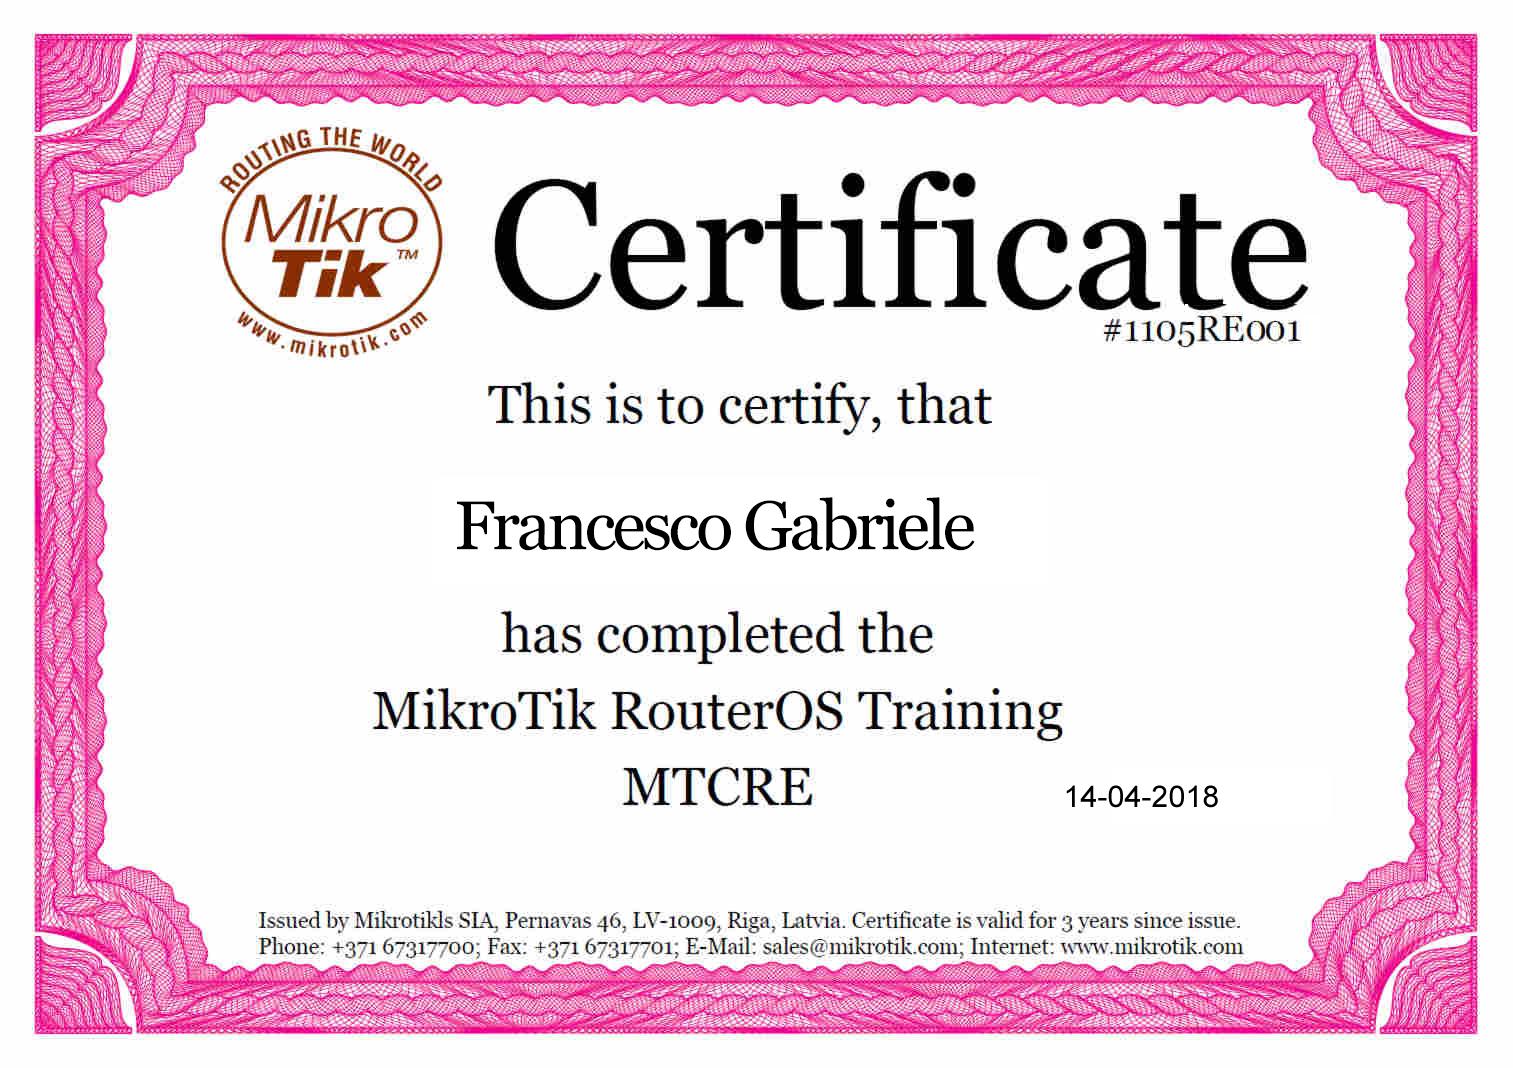 Certificato_frank_02